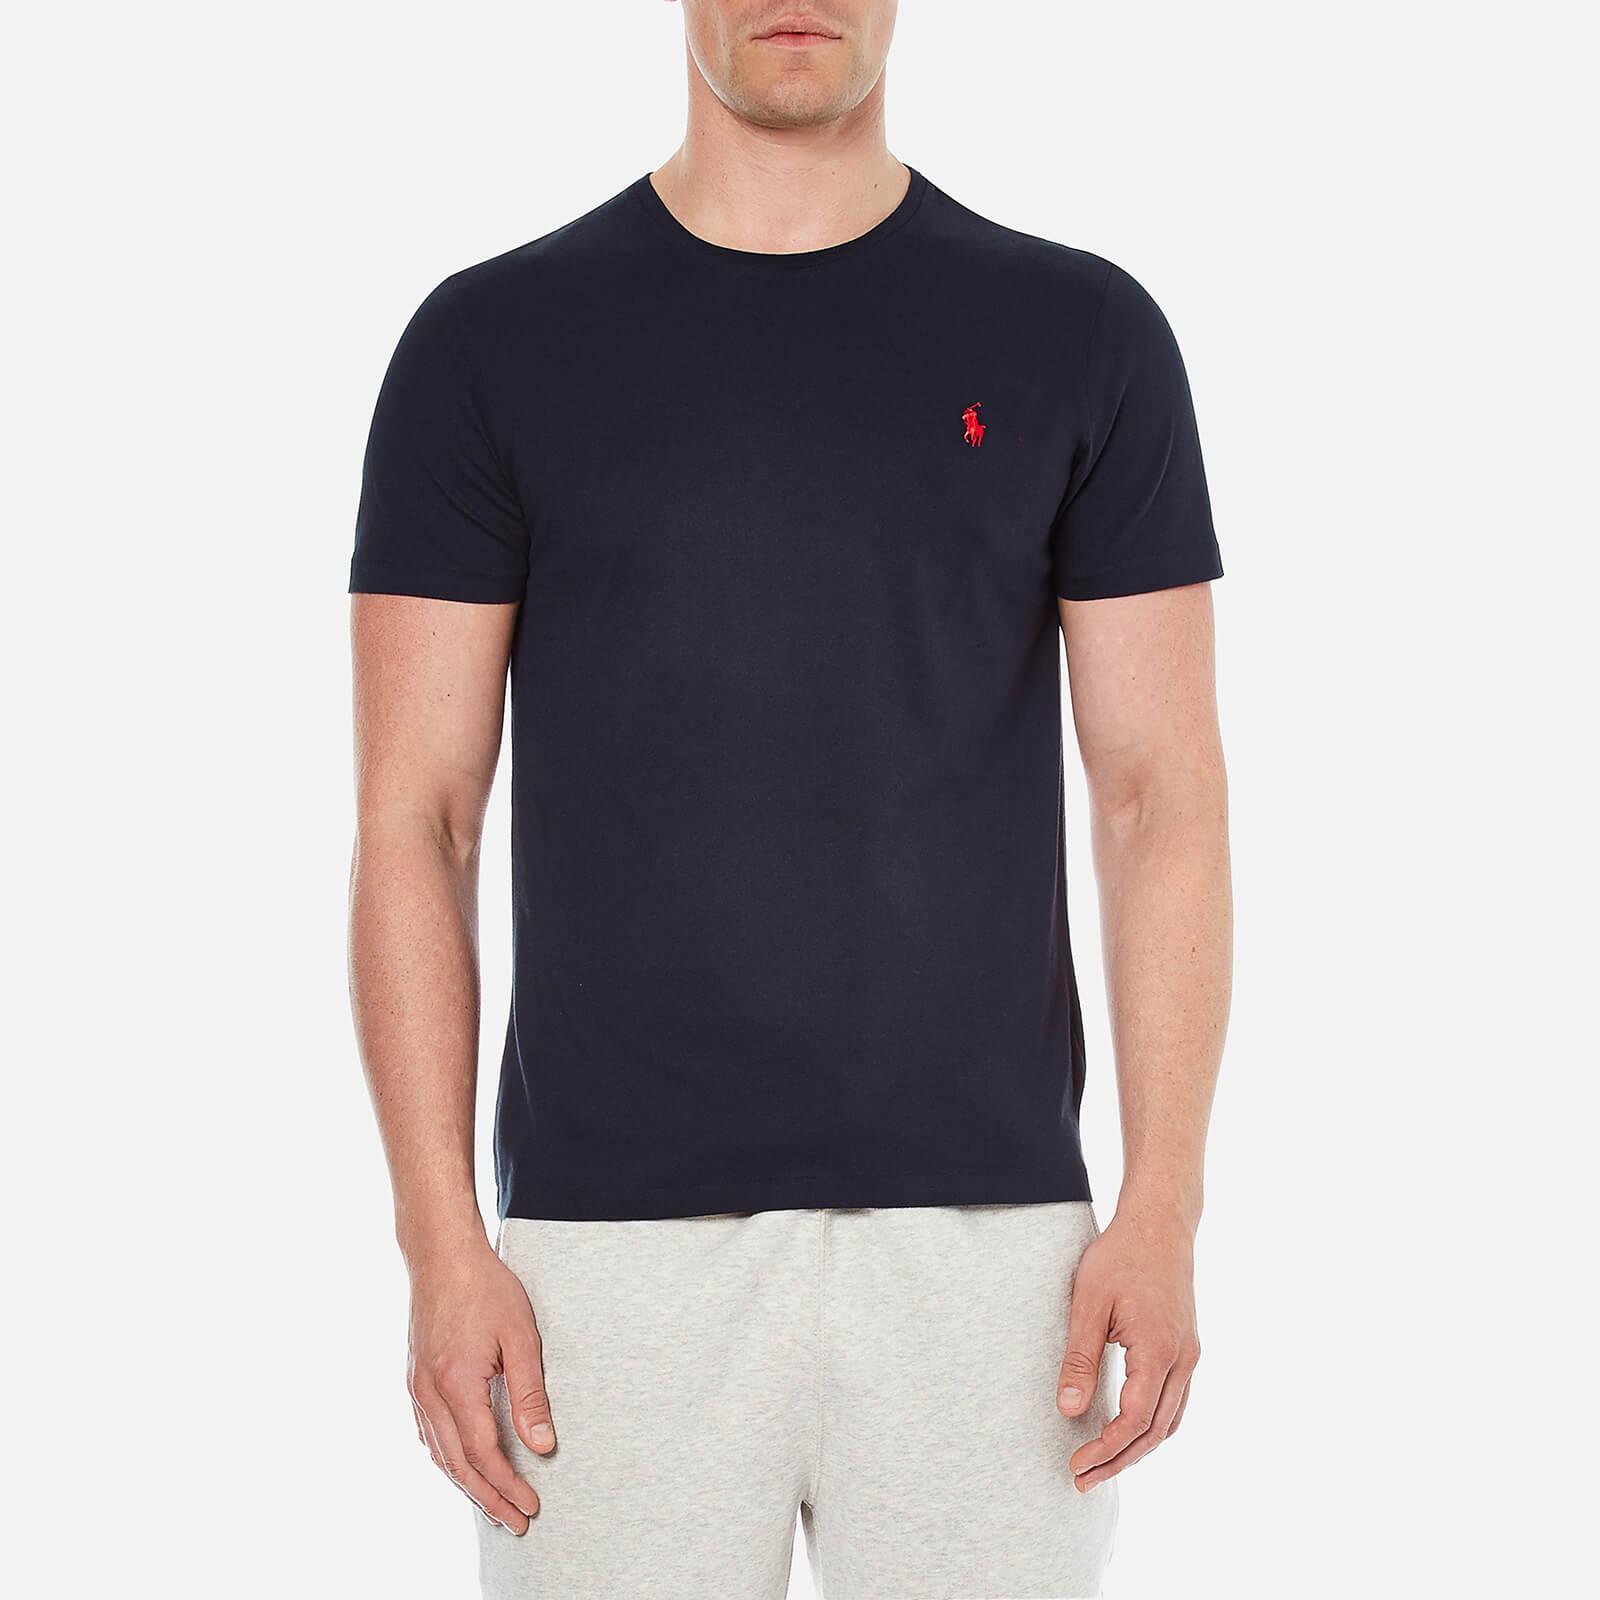 d7f84d94 Polo Ralph Lauren Men's Short Sleeved Crew Neck T-Shirt - Ink - Free UK  Delivery over £50